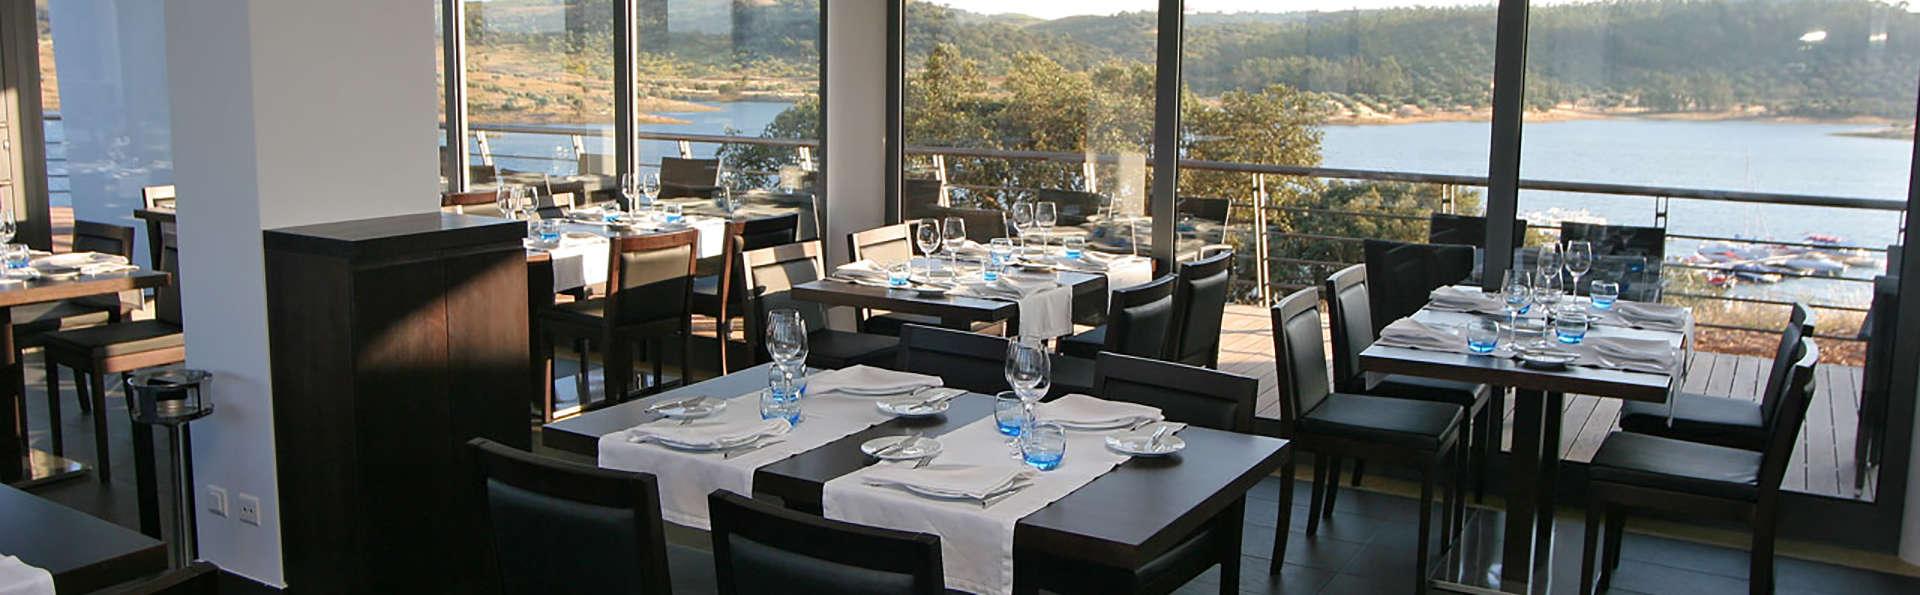 Amieira Marina - Edit_Restaurant.jpg